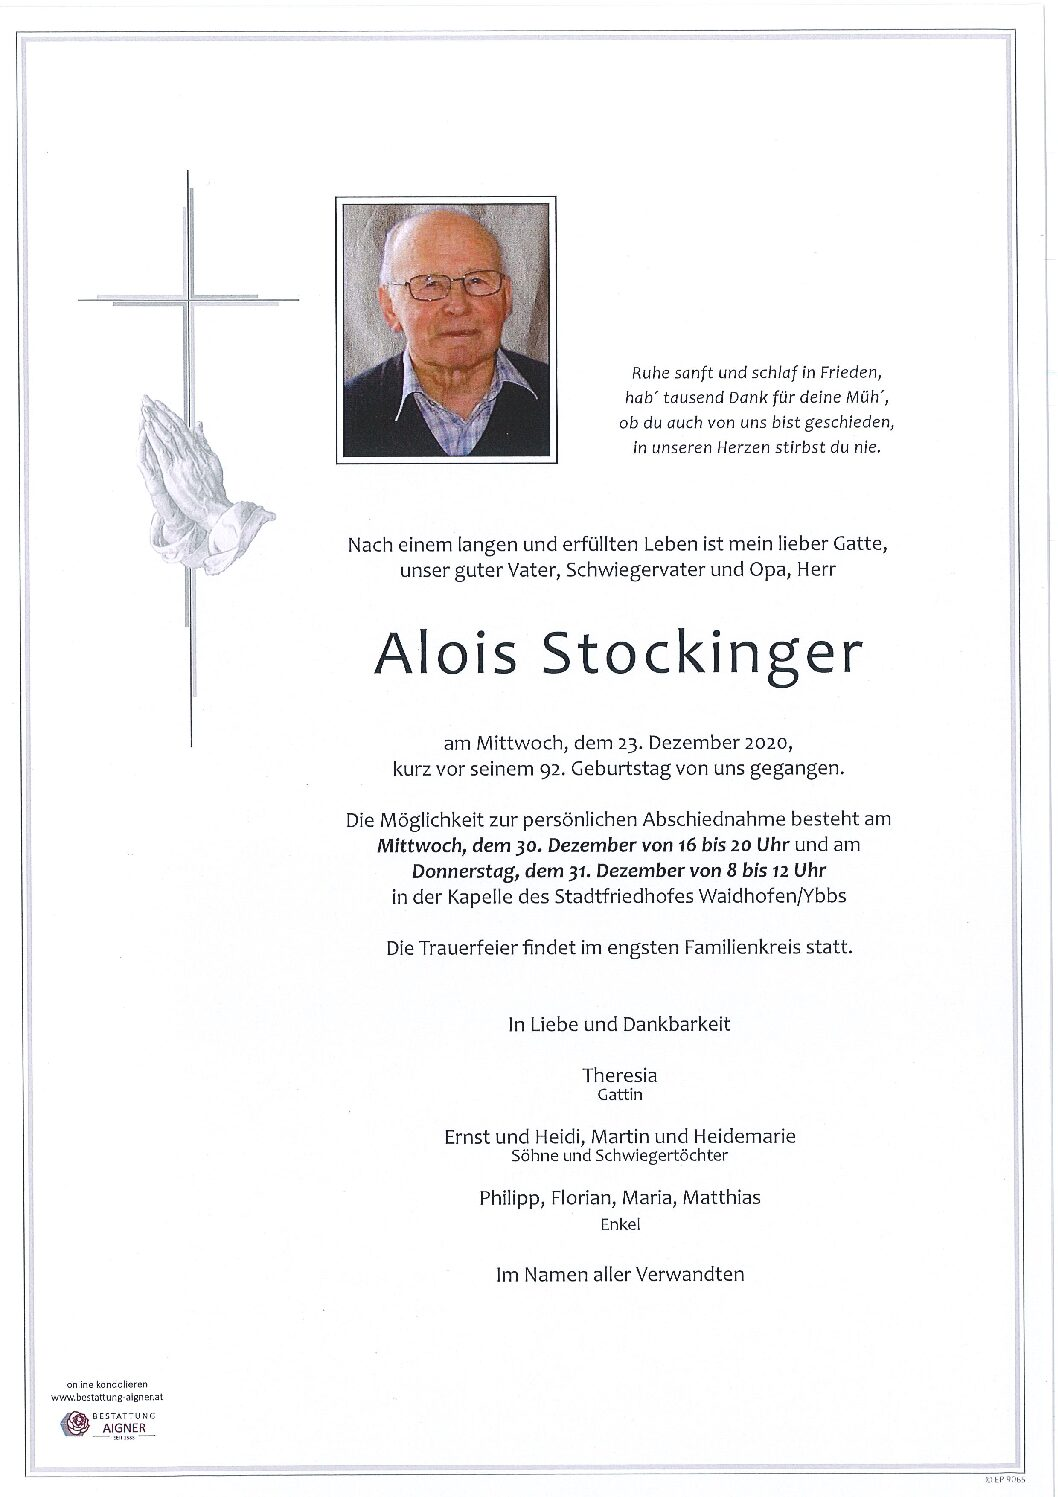 Alois Stockinger